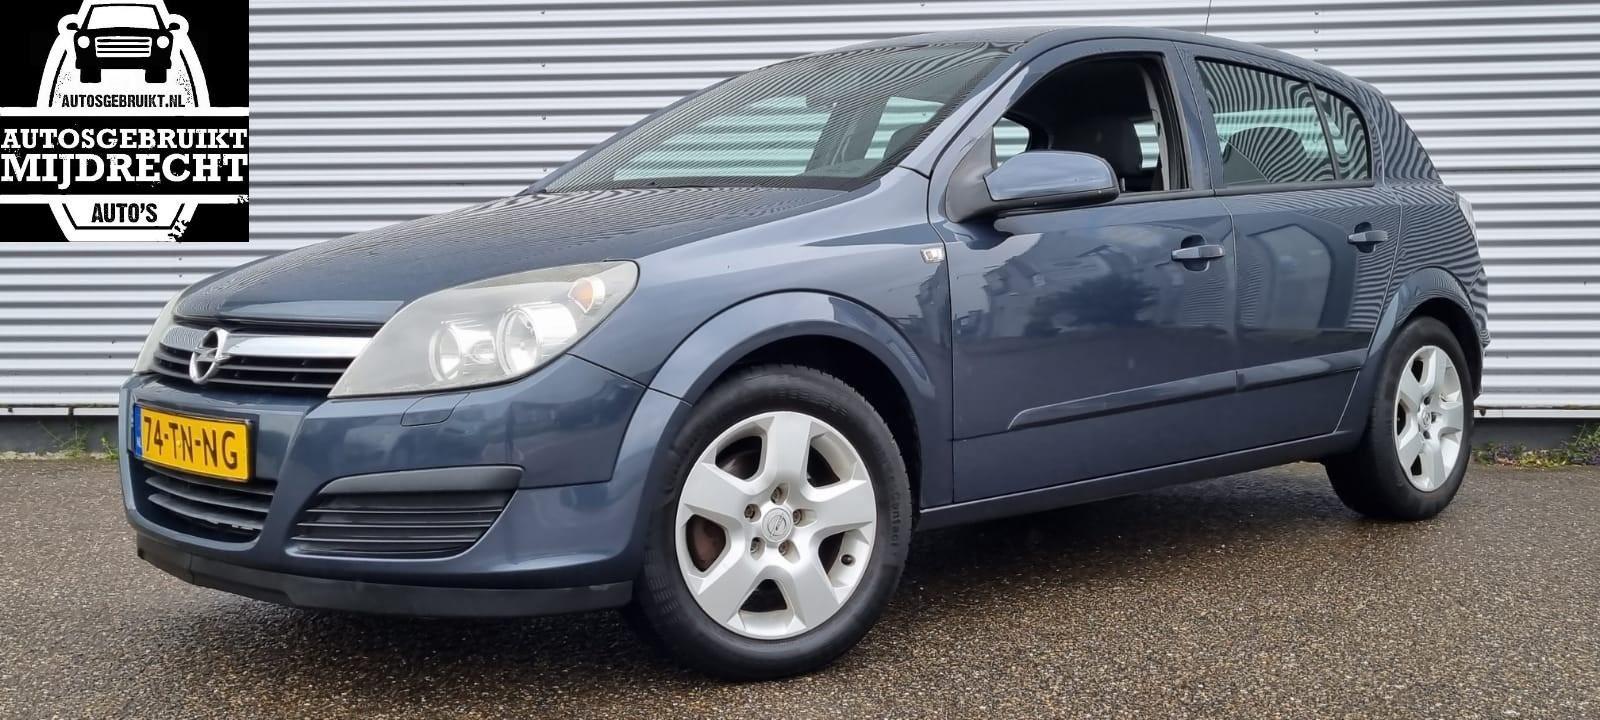 Opel Astra occasion - Autosgebruikt Mijdrecht